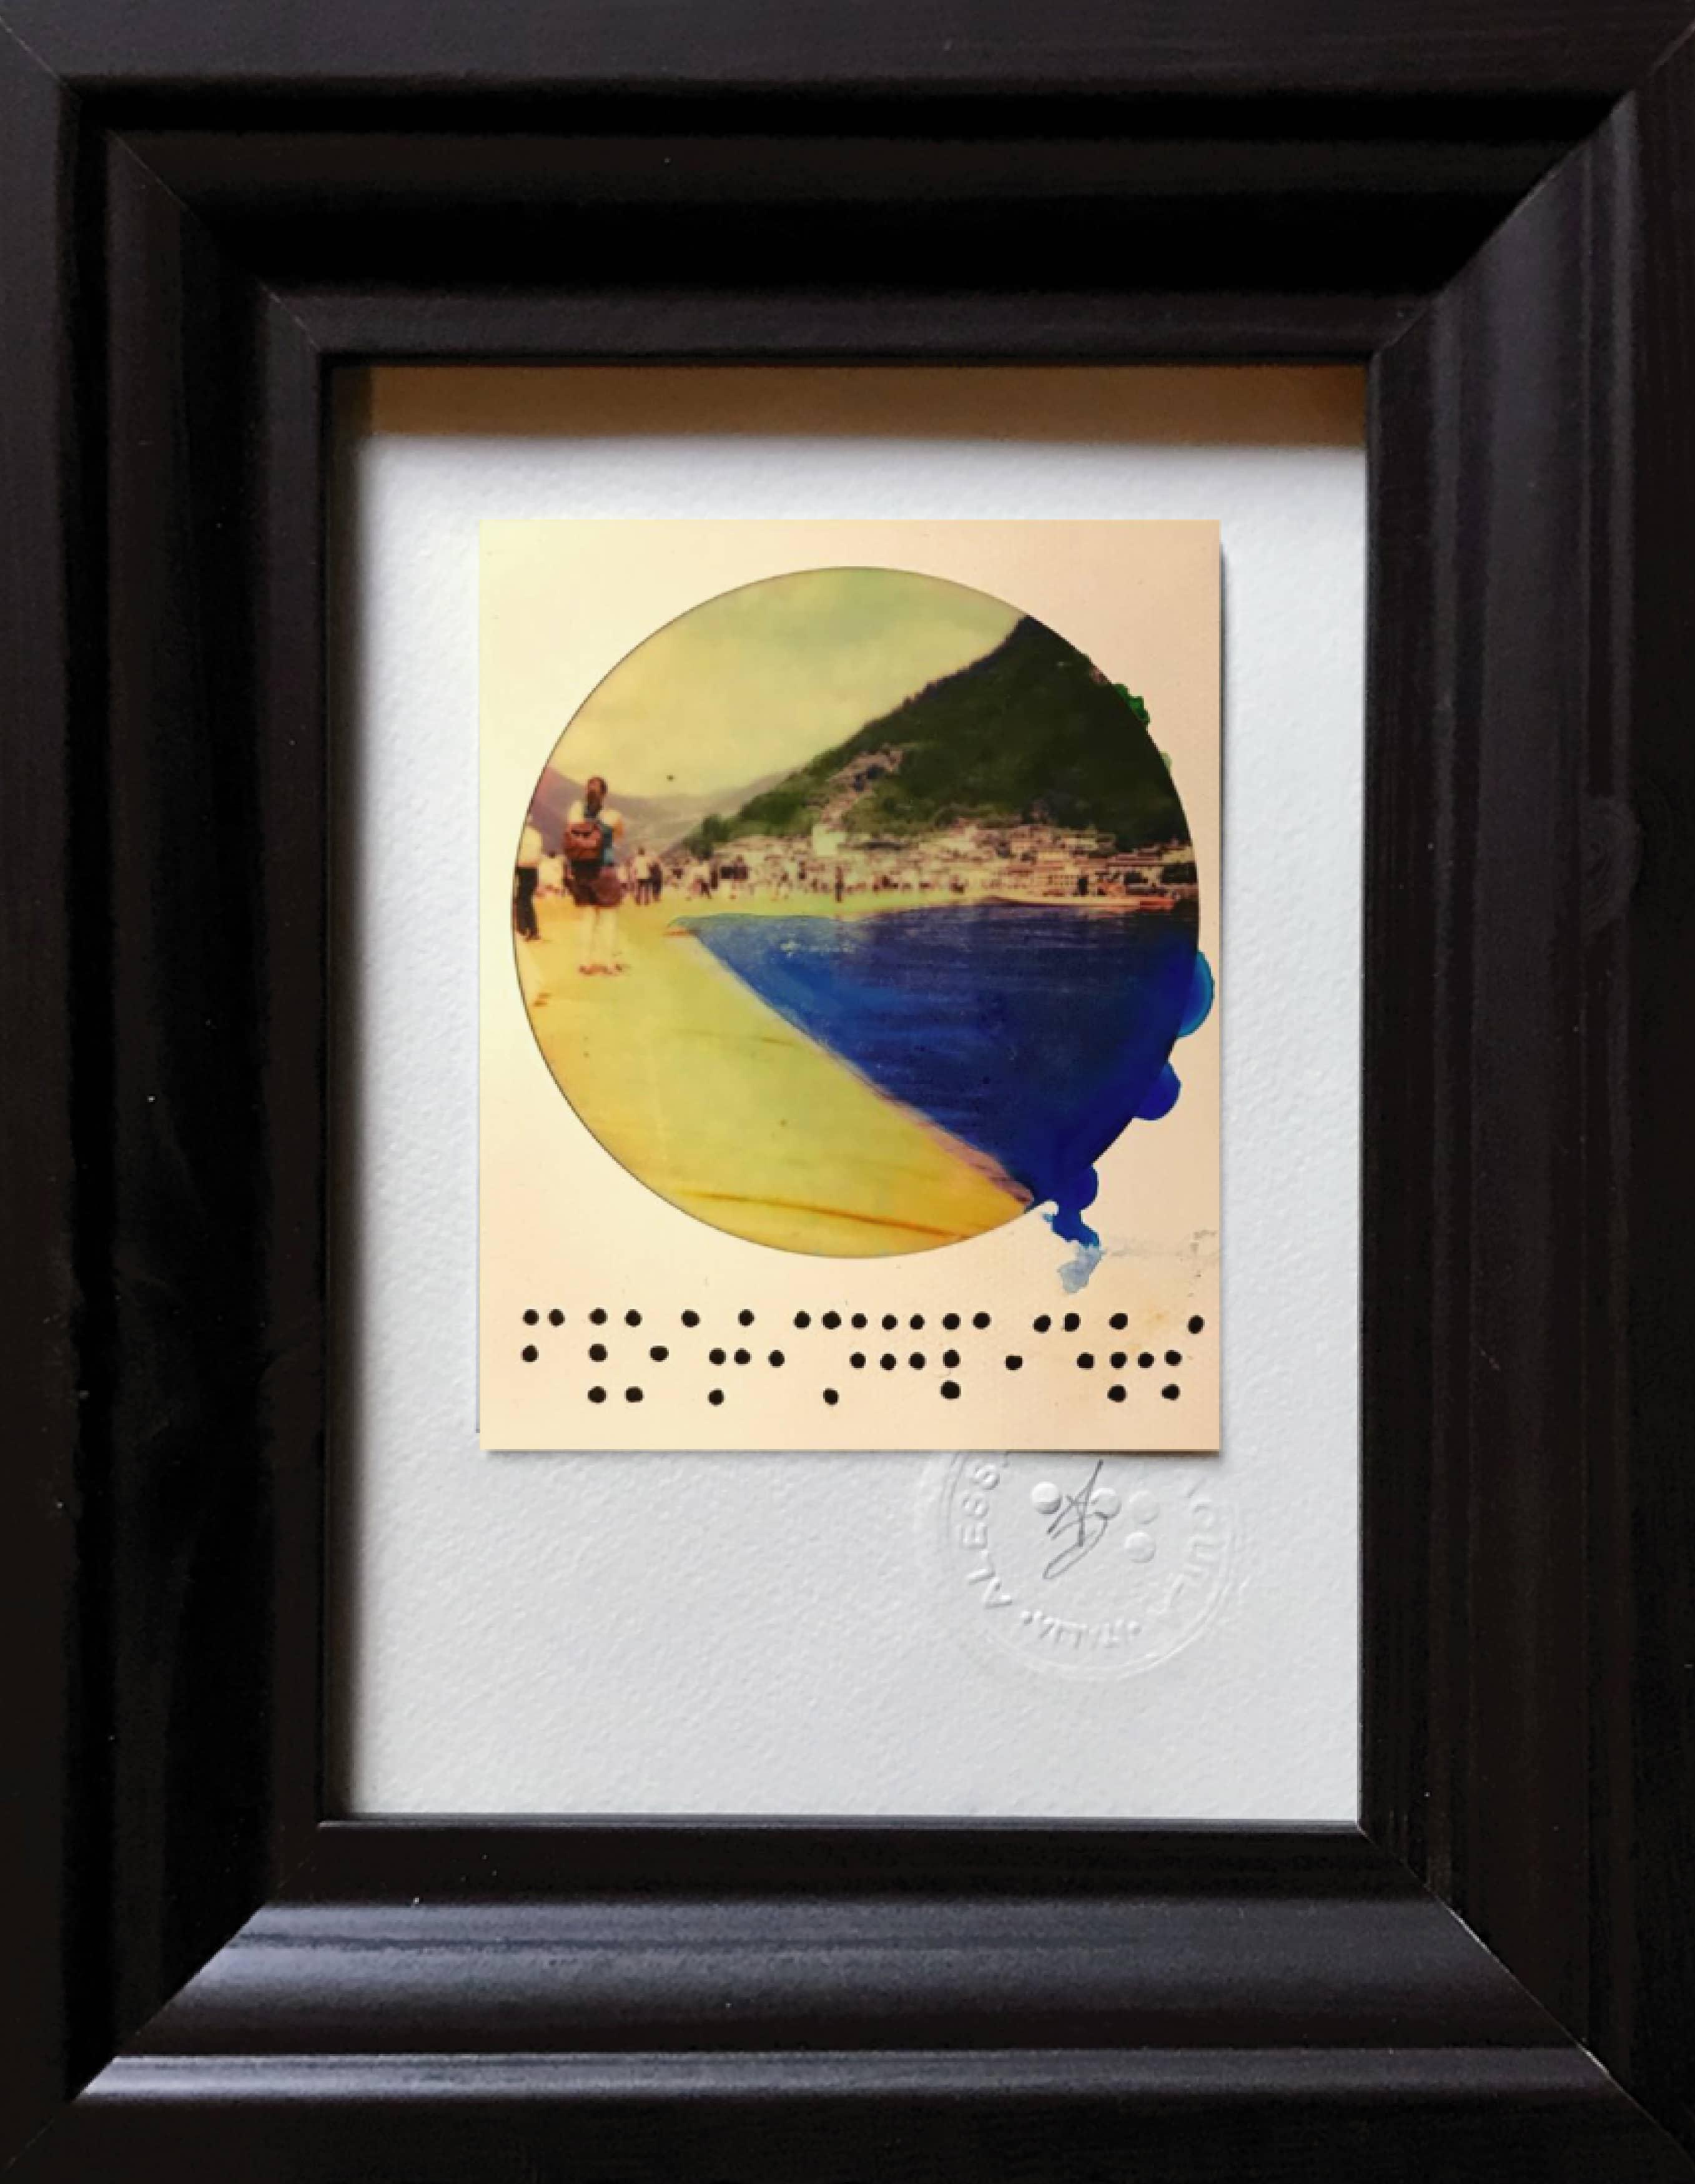 The Floating Polaroid #7